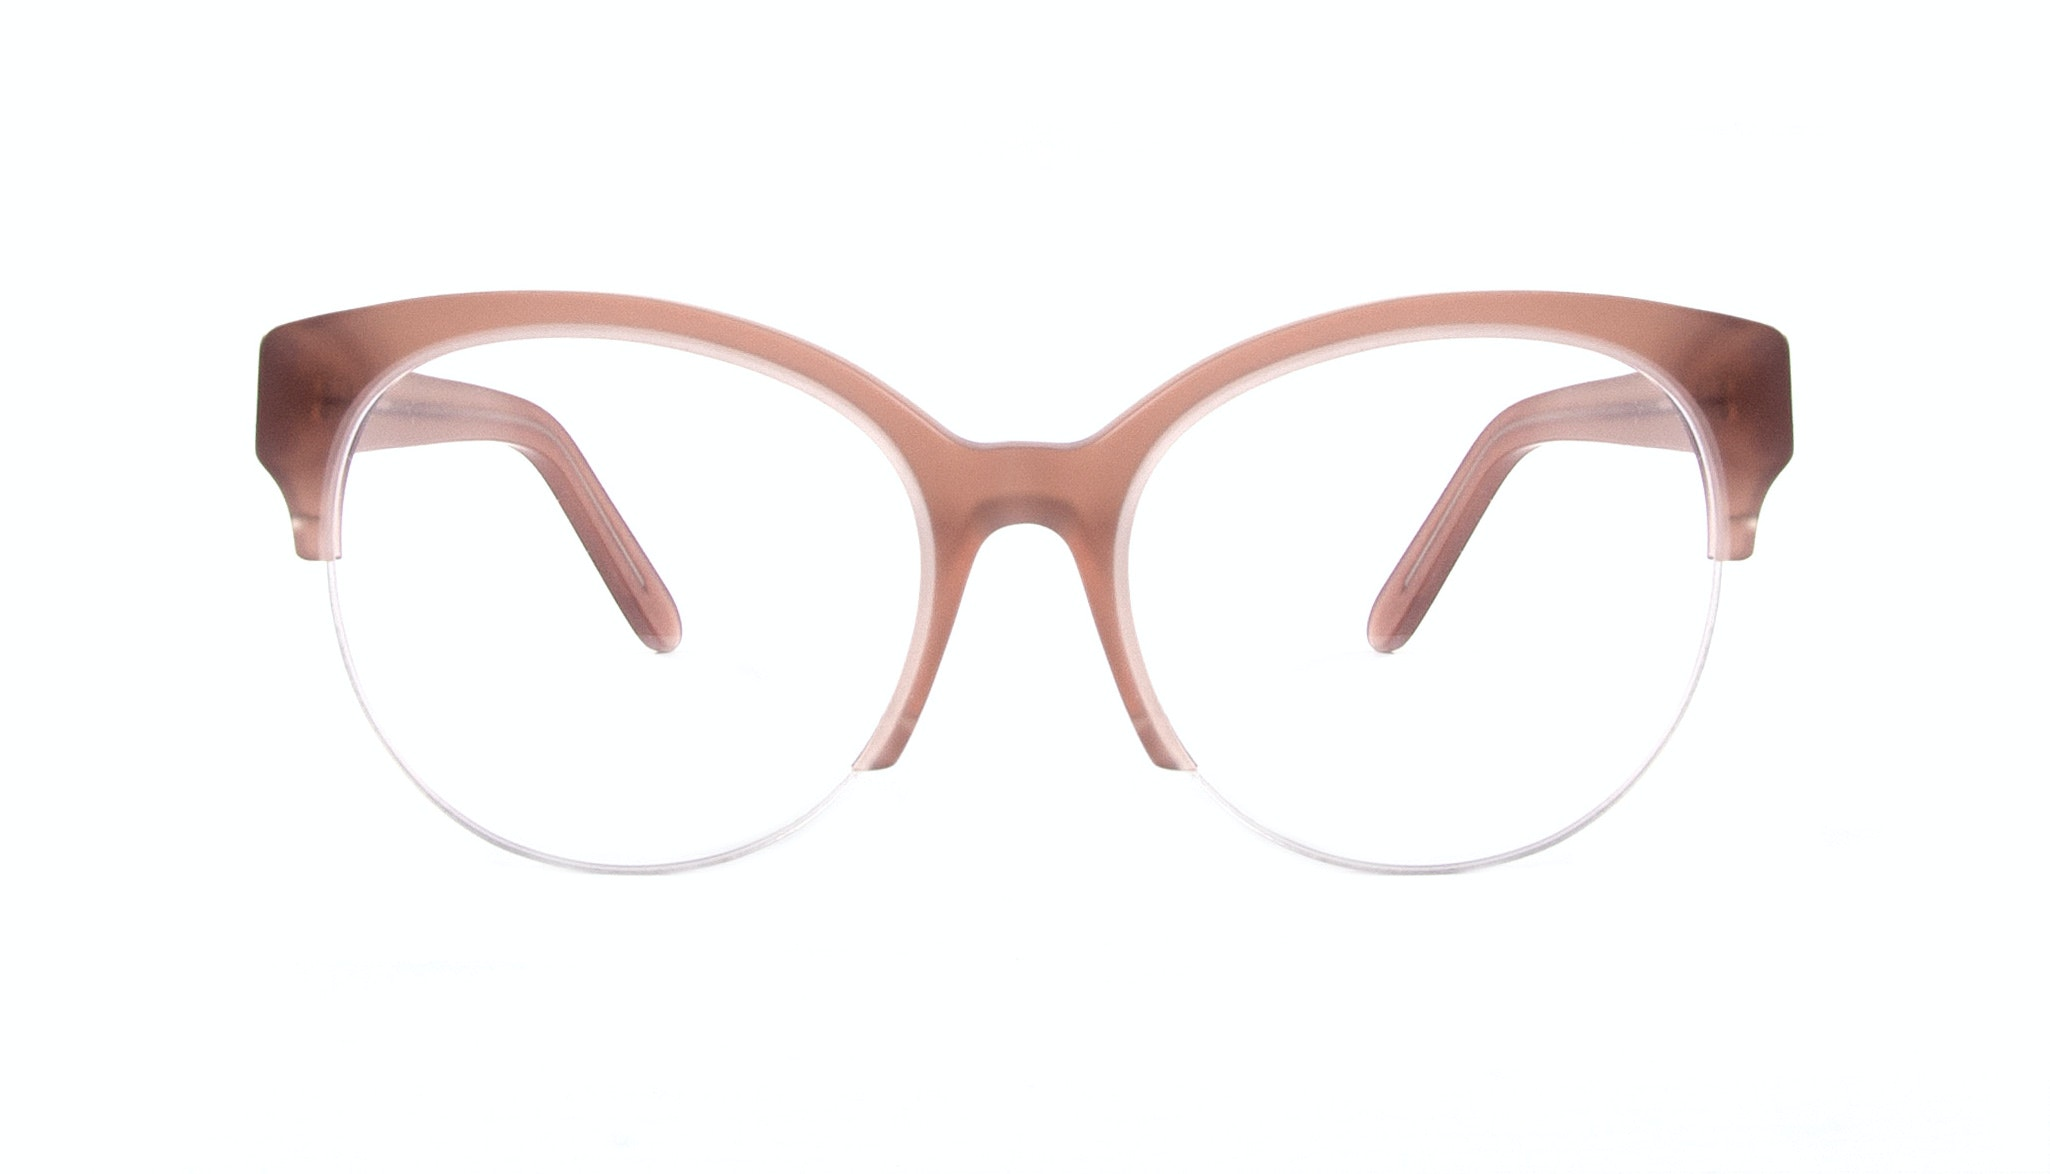 Affordable Fashion Glasses Cat Eye Round Semi-Rimless Eyeglasses Women Eclipse Light Old Rose Front